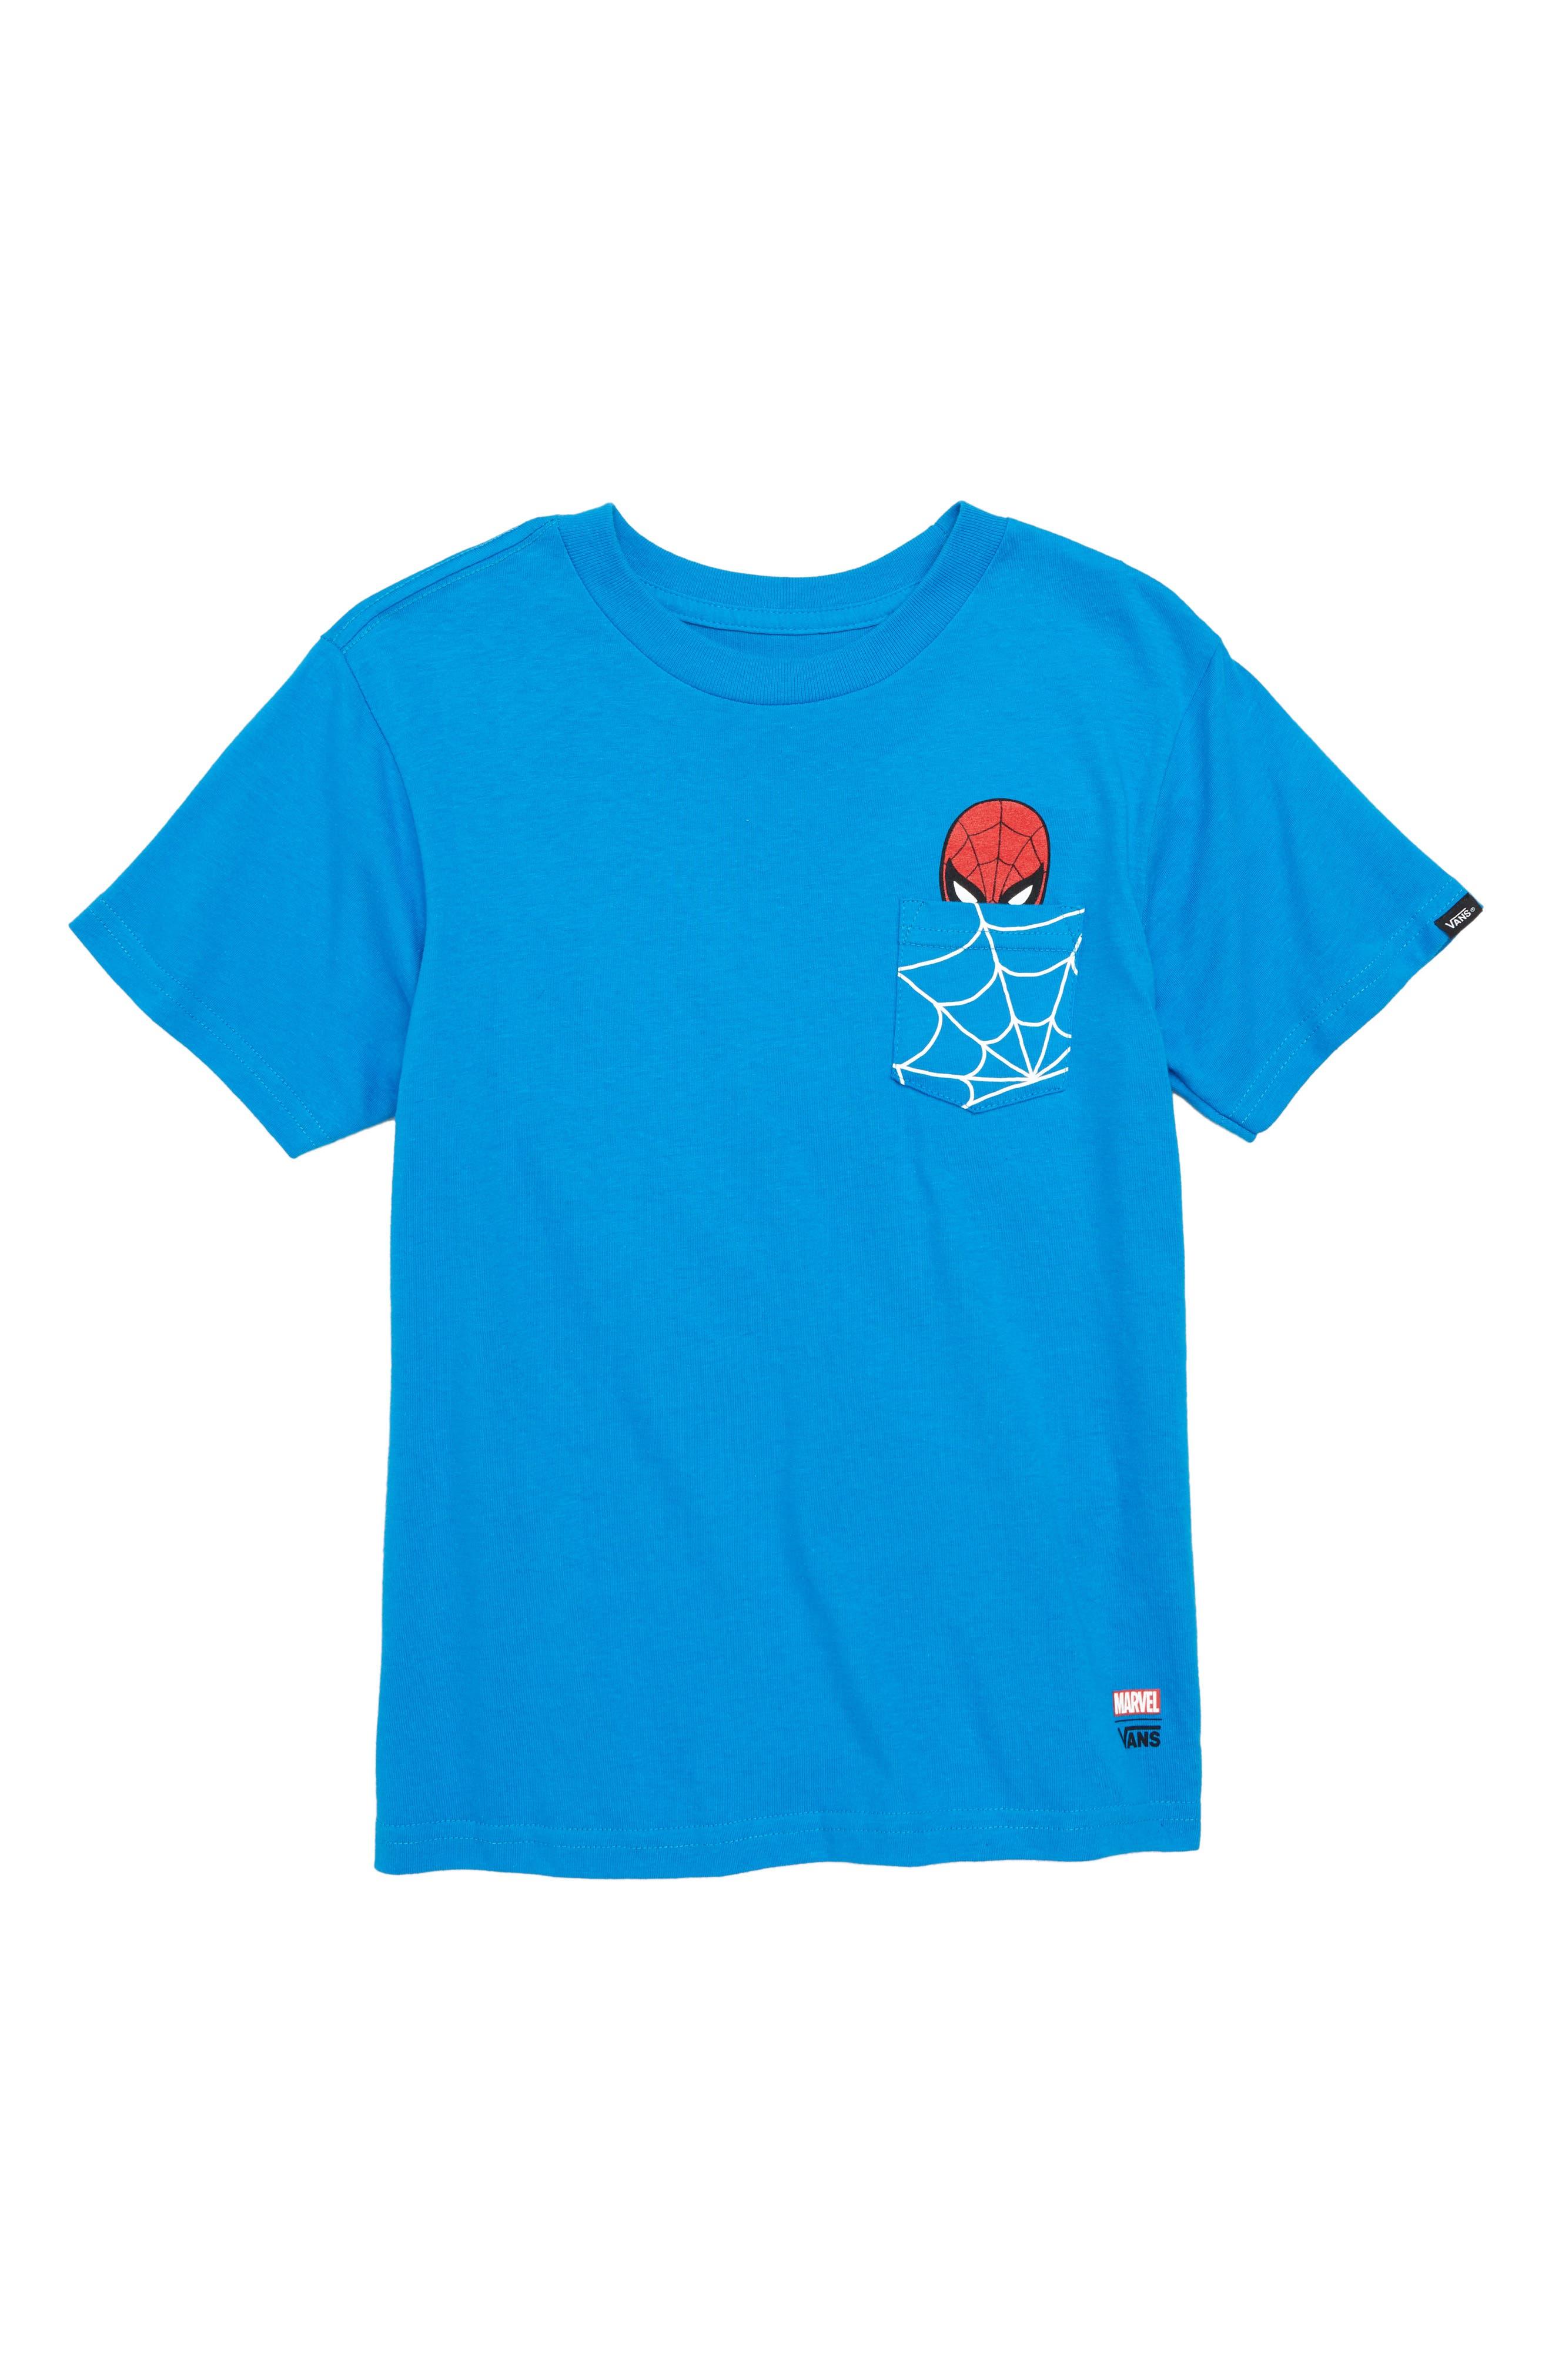 x Marvel<sup>®</sup> Avengers Spider-Man<sup>™</sup> Pocket T-Shirt,                             Main thumbnail 1, color,                             Blue